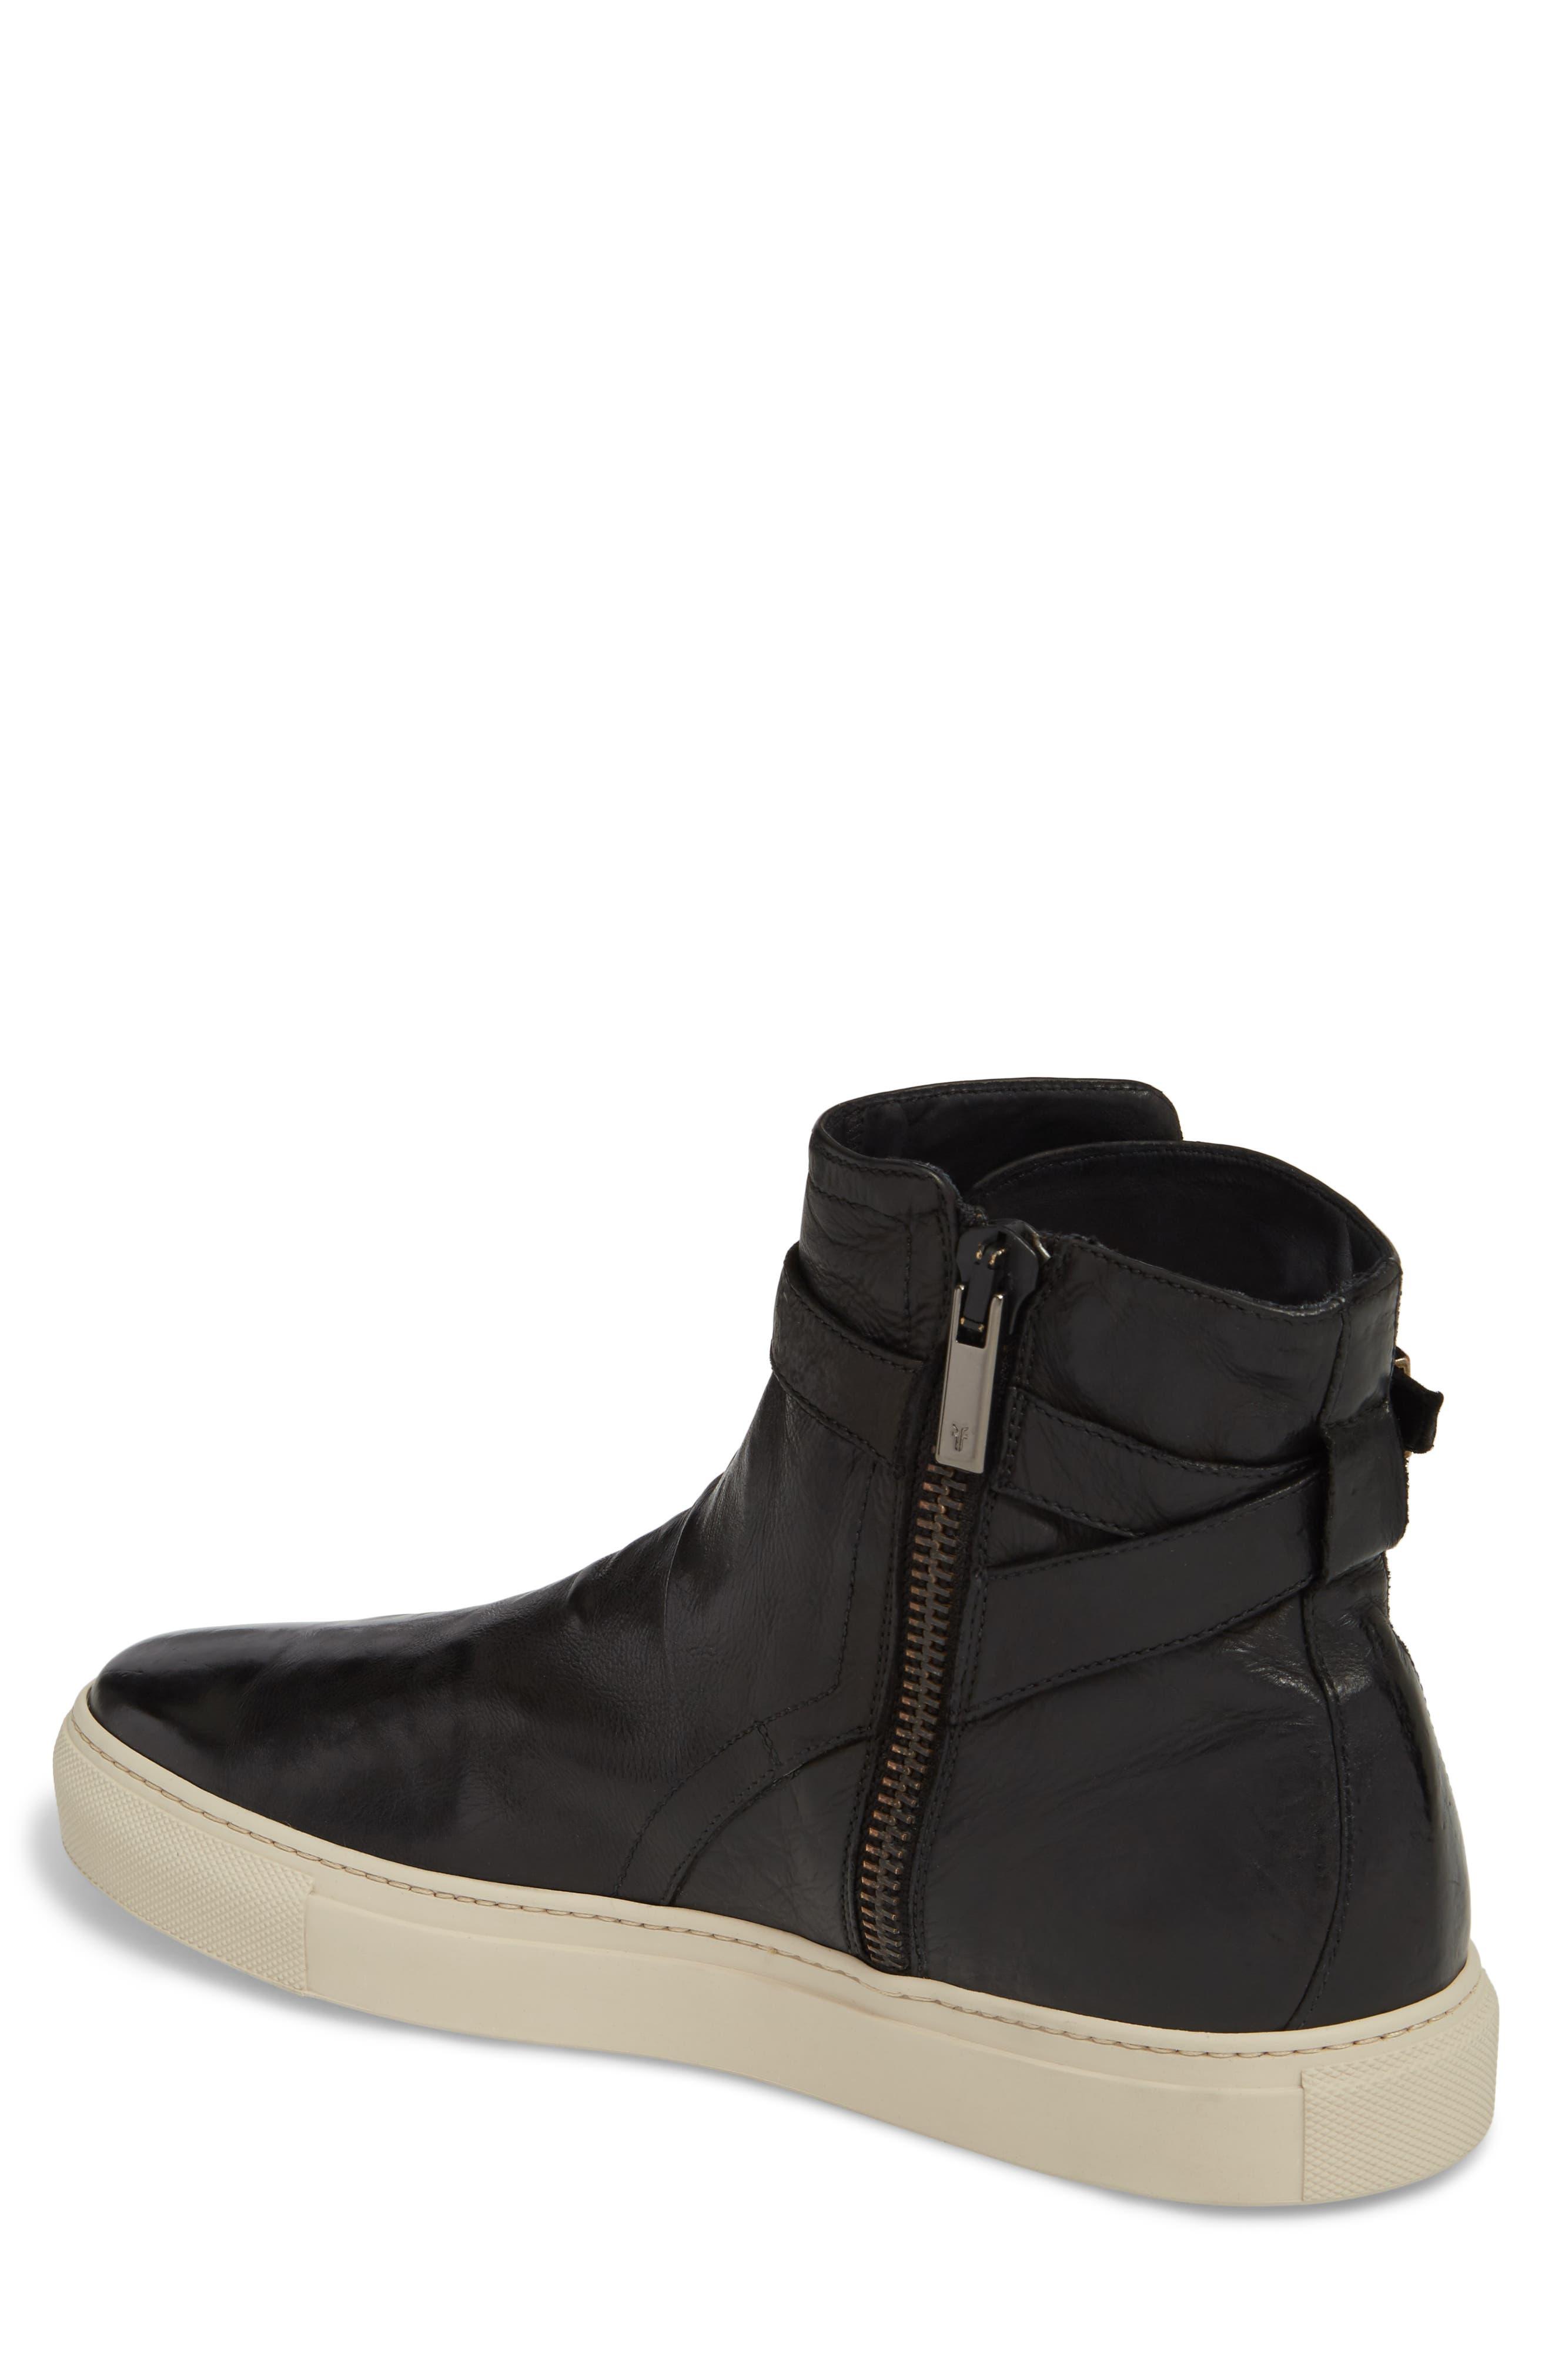 Owen Jodhpur High Top Sneaker,                             Alternate thumbnail 3, color,